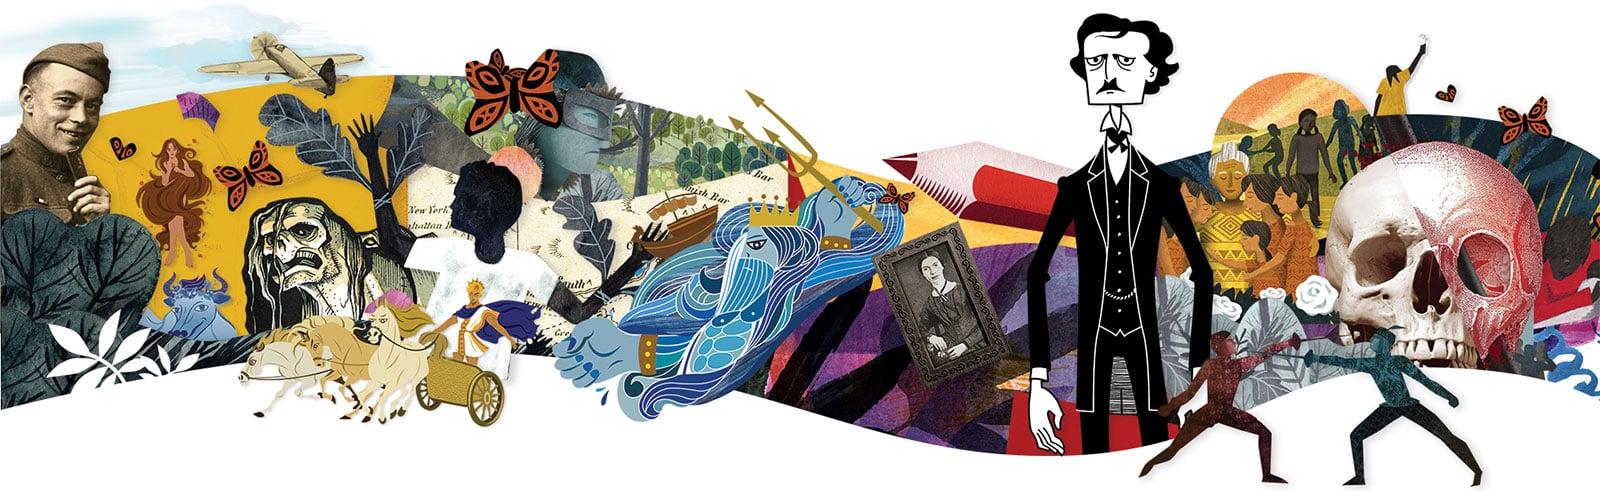 amplify_ela_artwork_banner.jpg